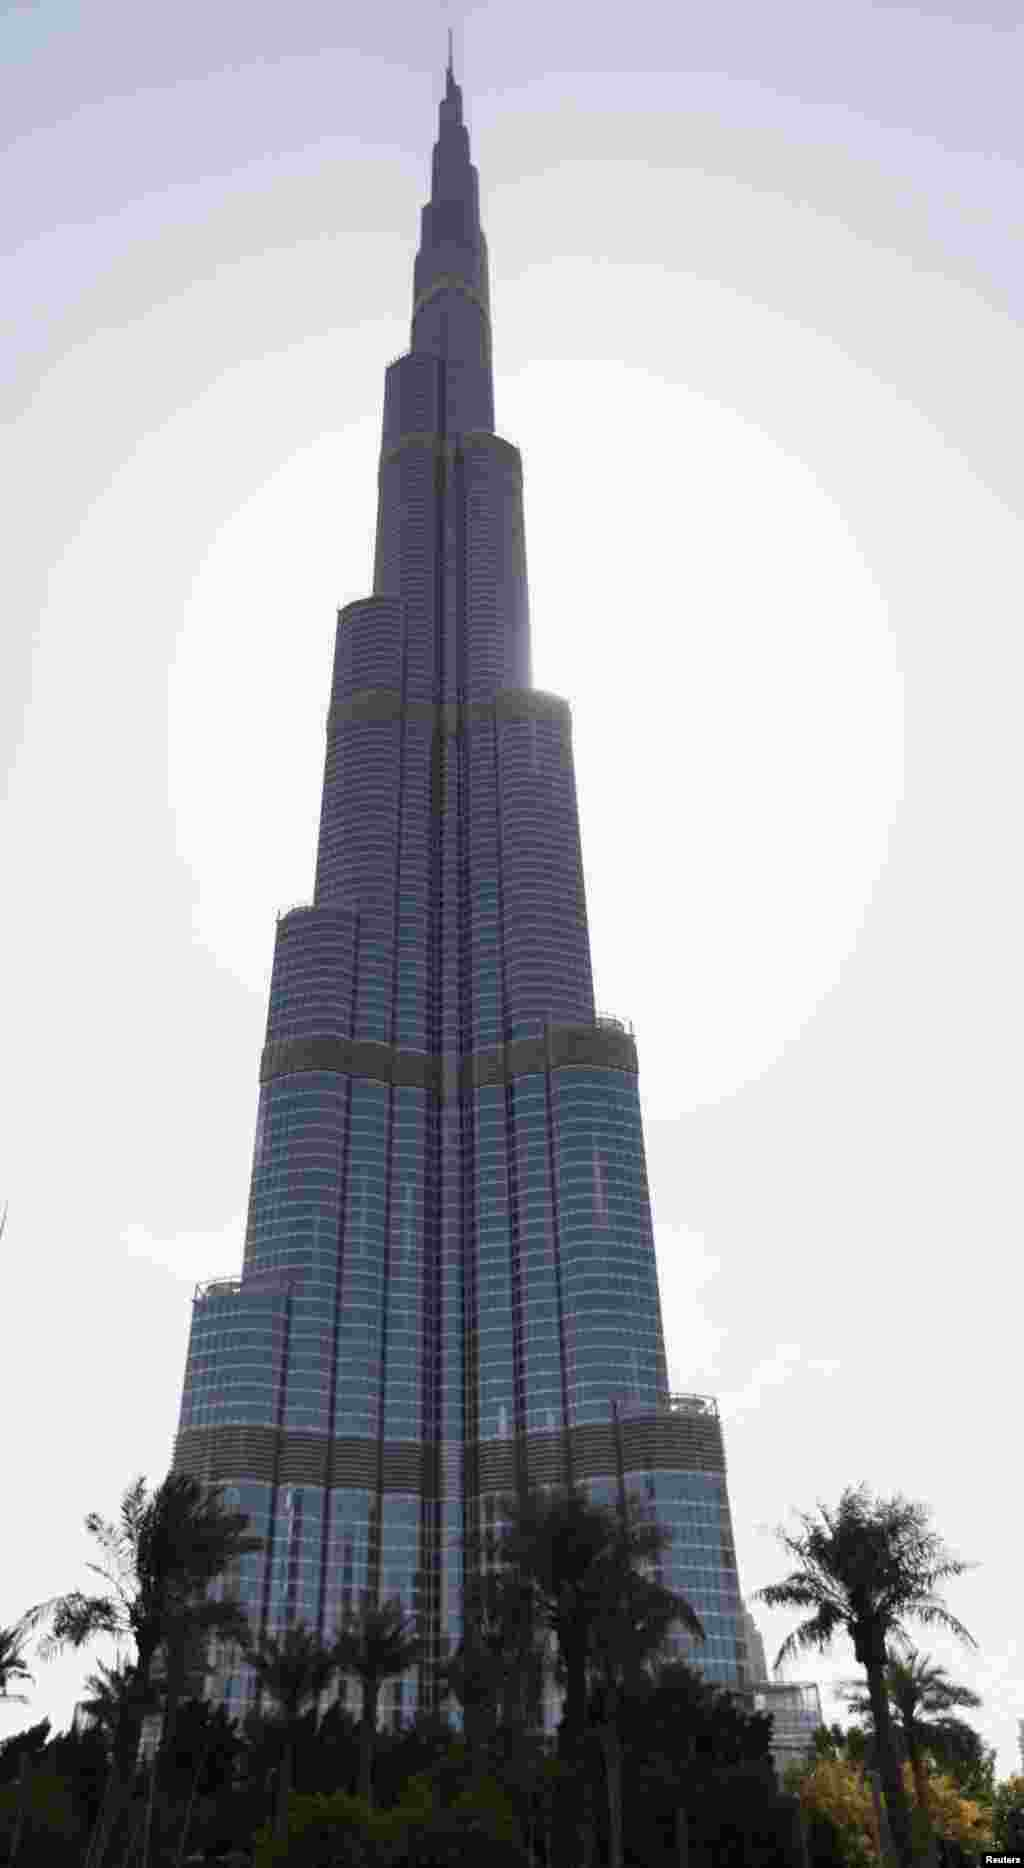 دنیا کی بلند ترین عمارت برج خلیفہ